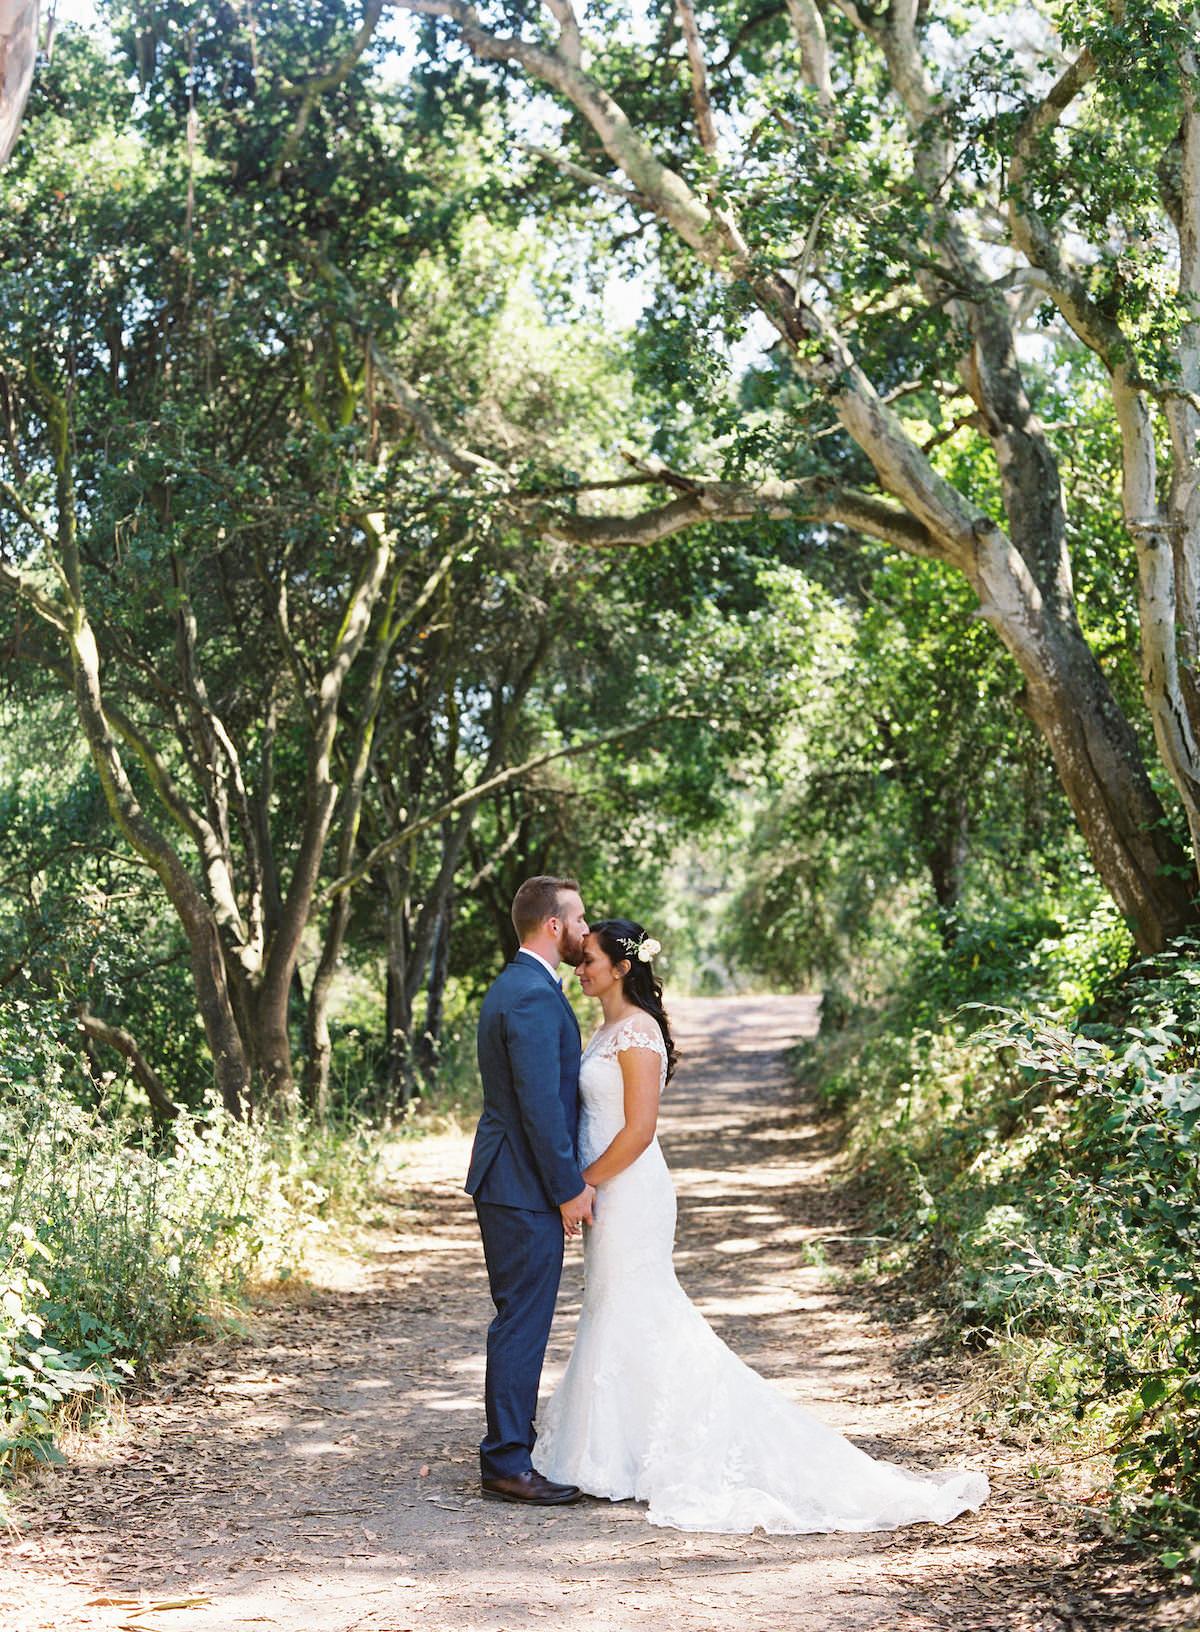 Santa-Barbara-Film-Wedding-Photography-San-Luis-Obispo-Ashley-Rae-Studio115.jpg